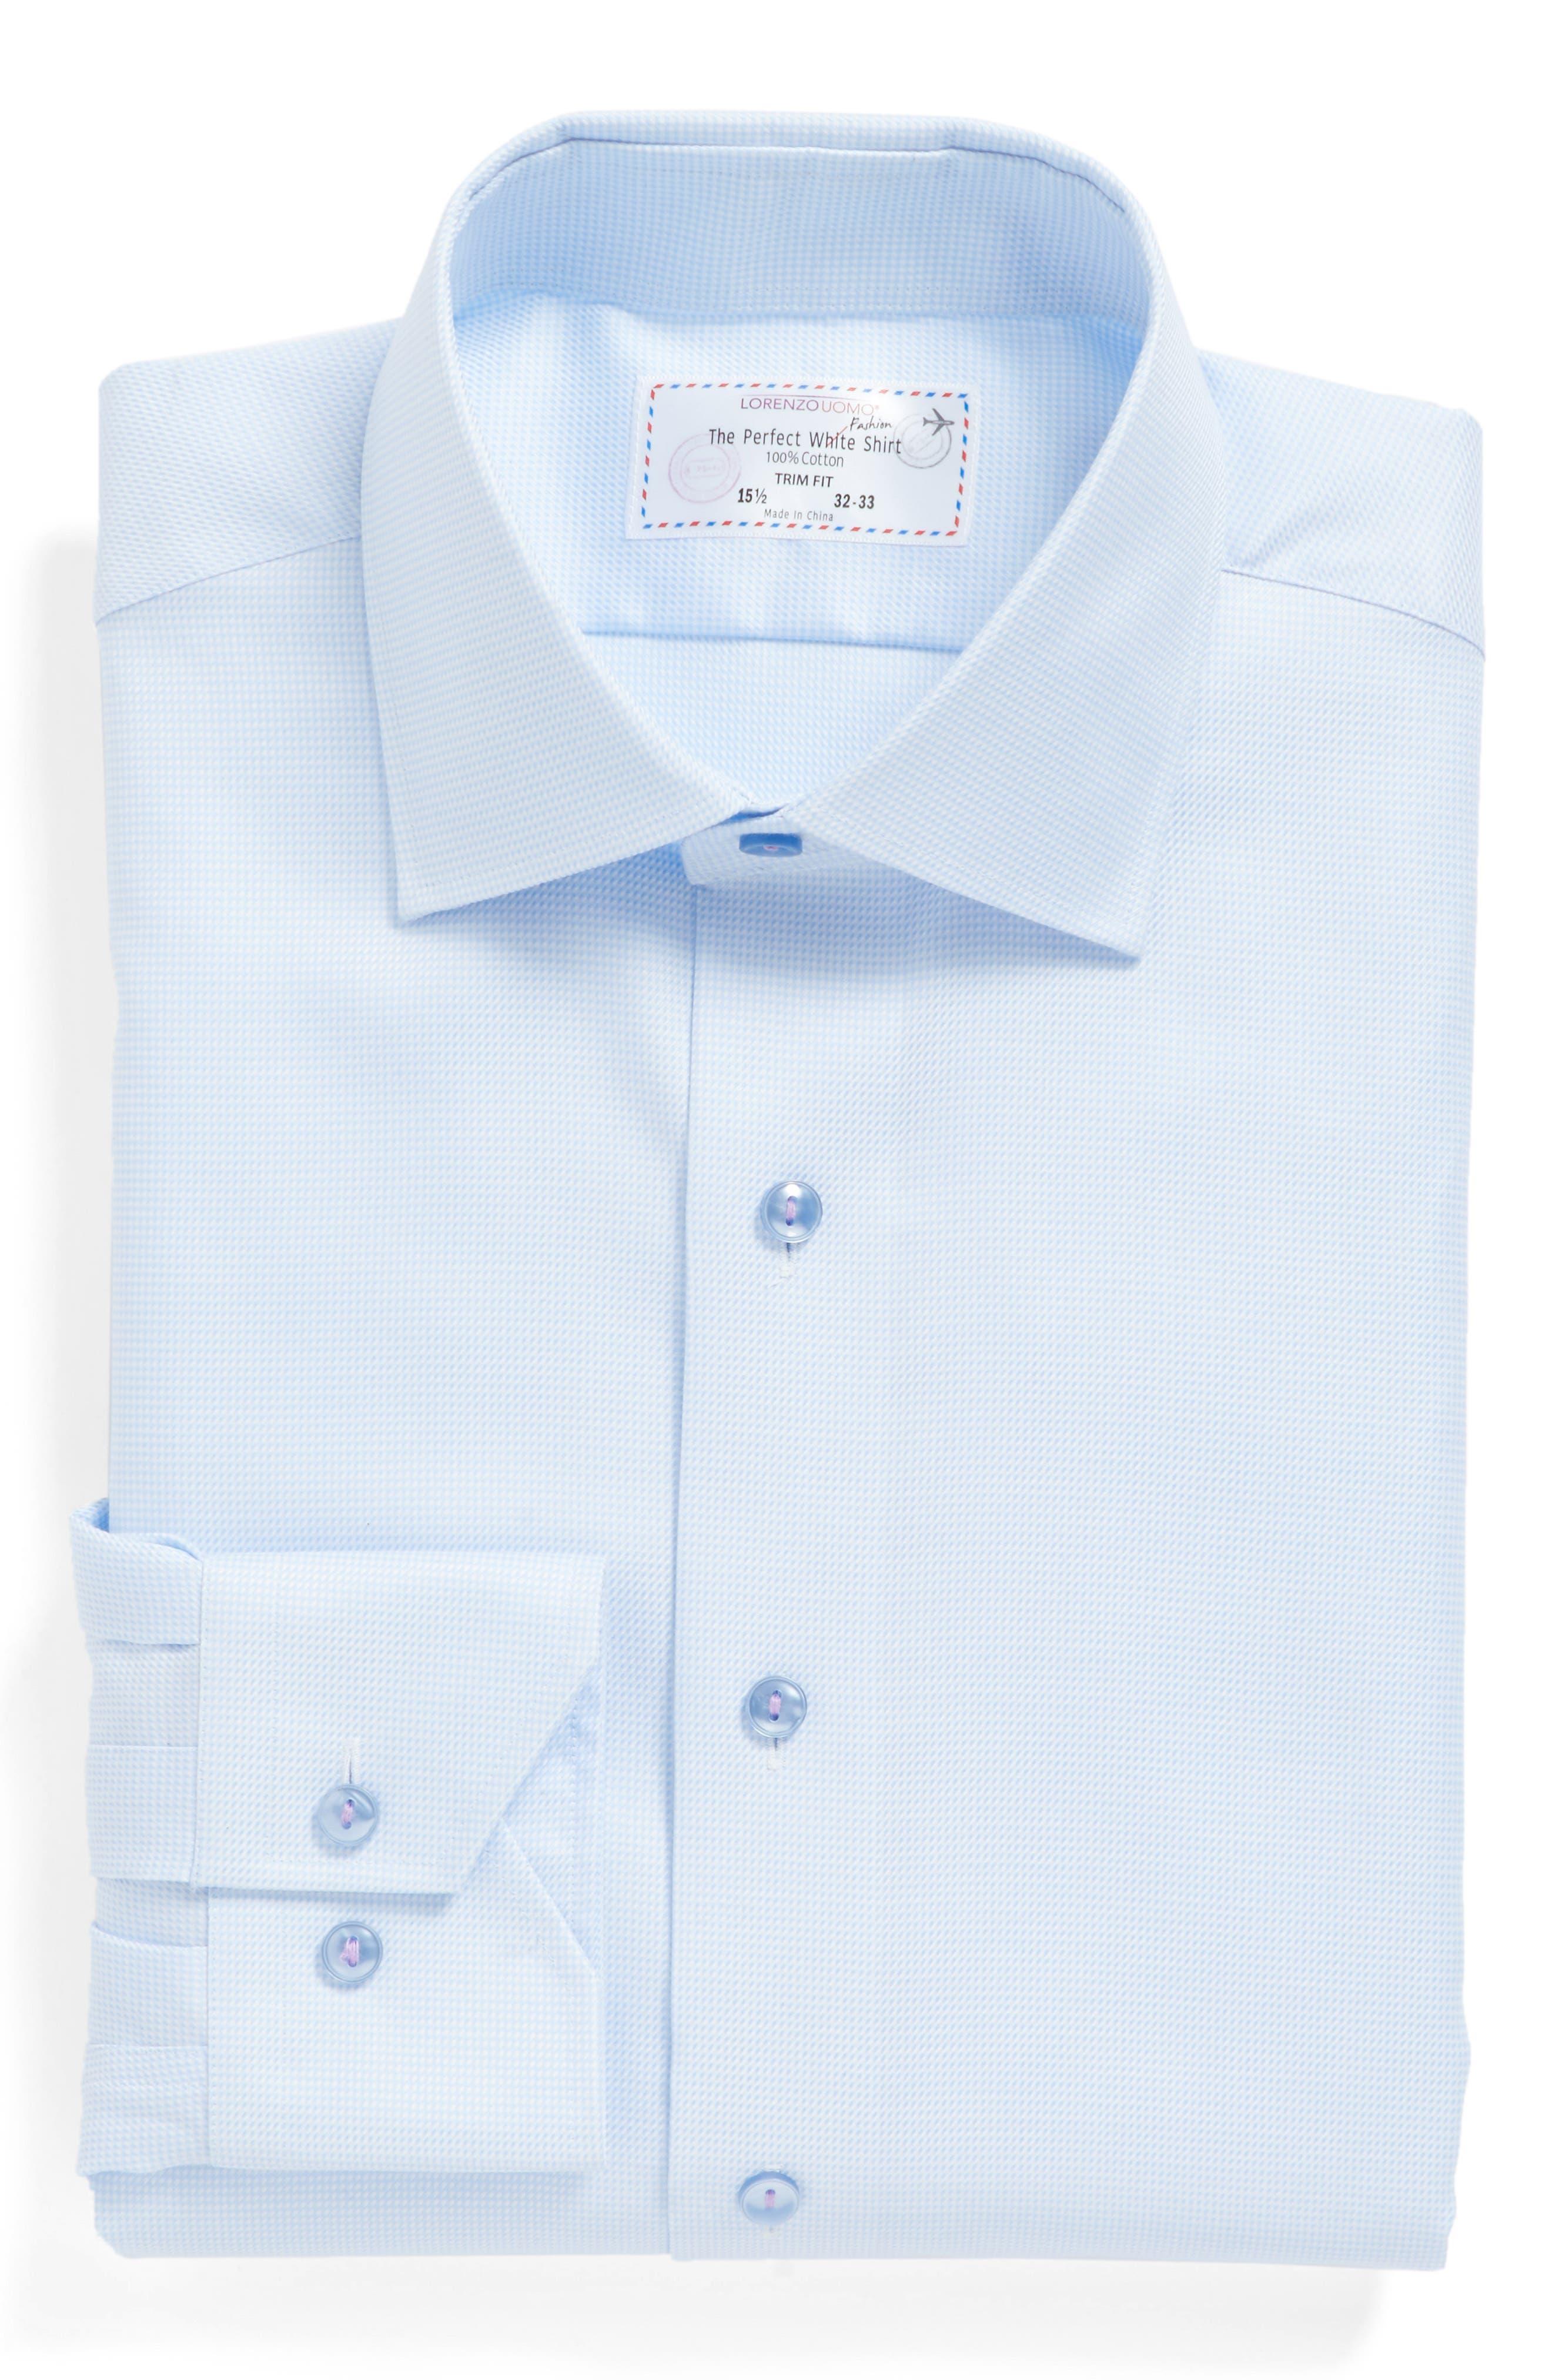 Alternate Image 1 Selected - Lorenzo Uomo Trim Fit Houndstooth Dress Shirt